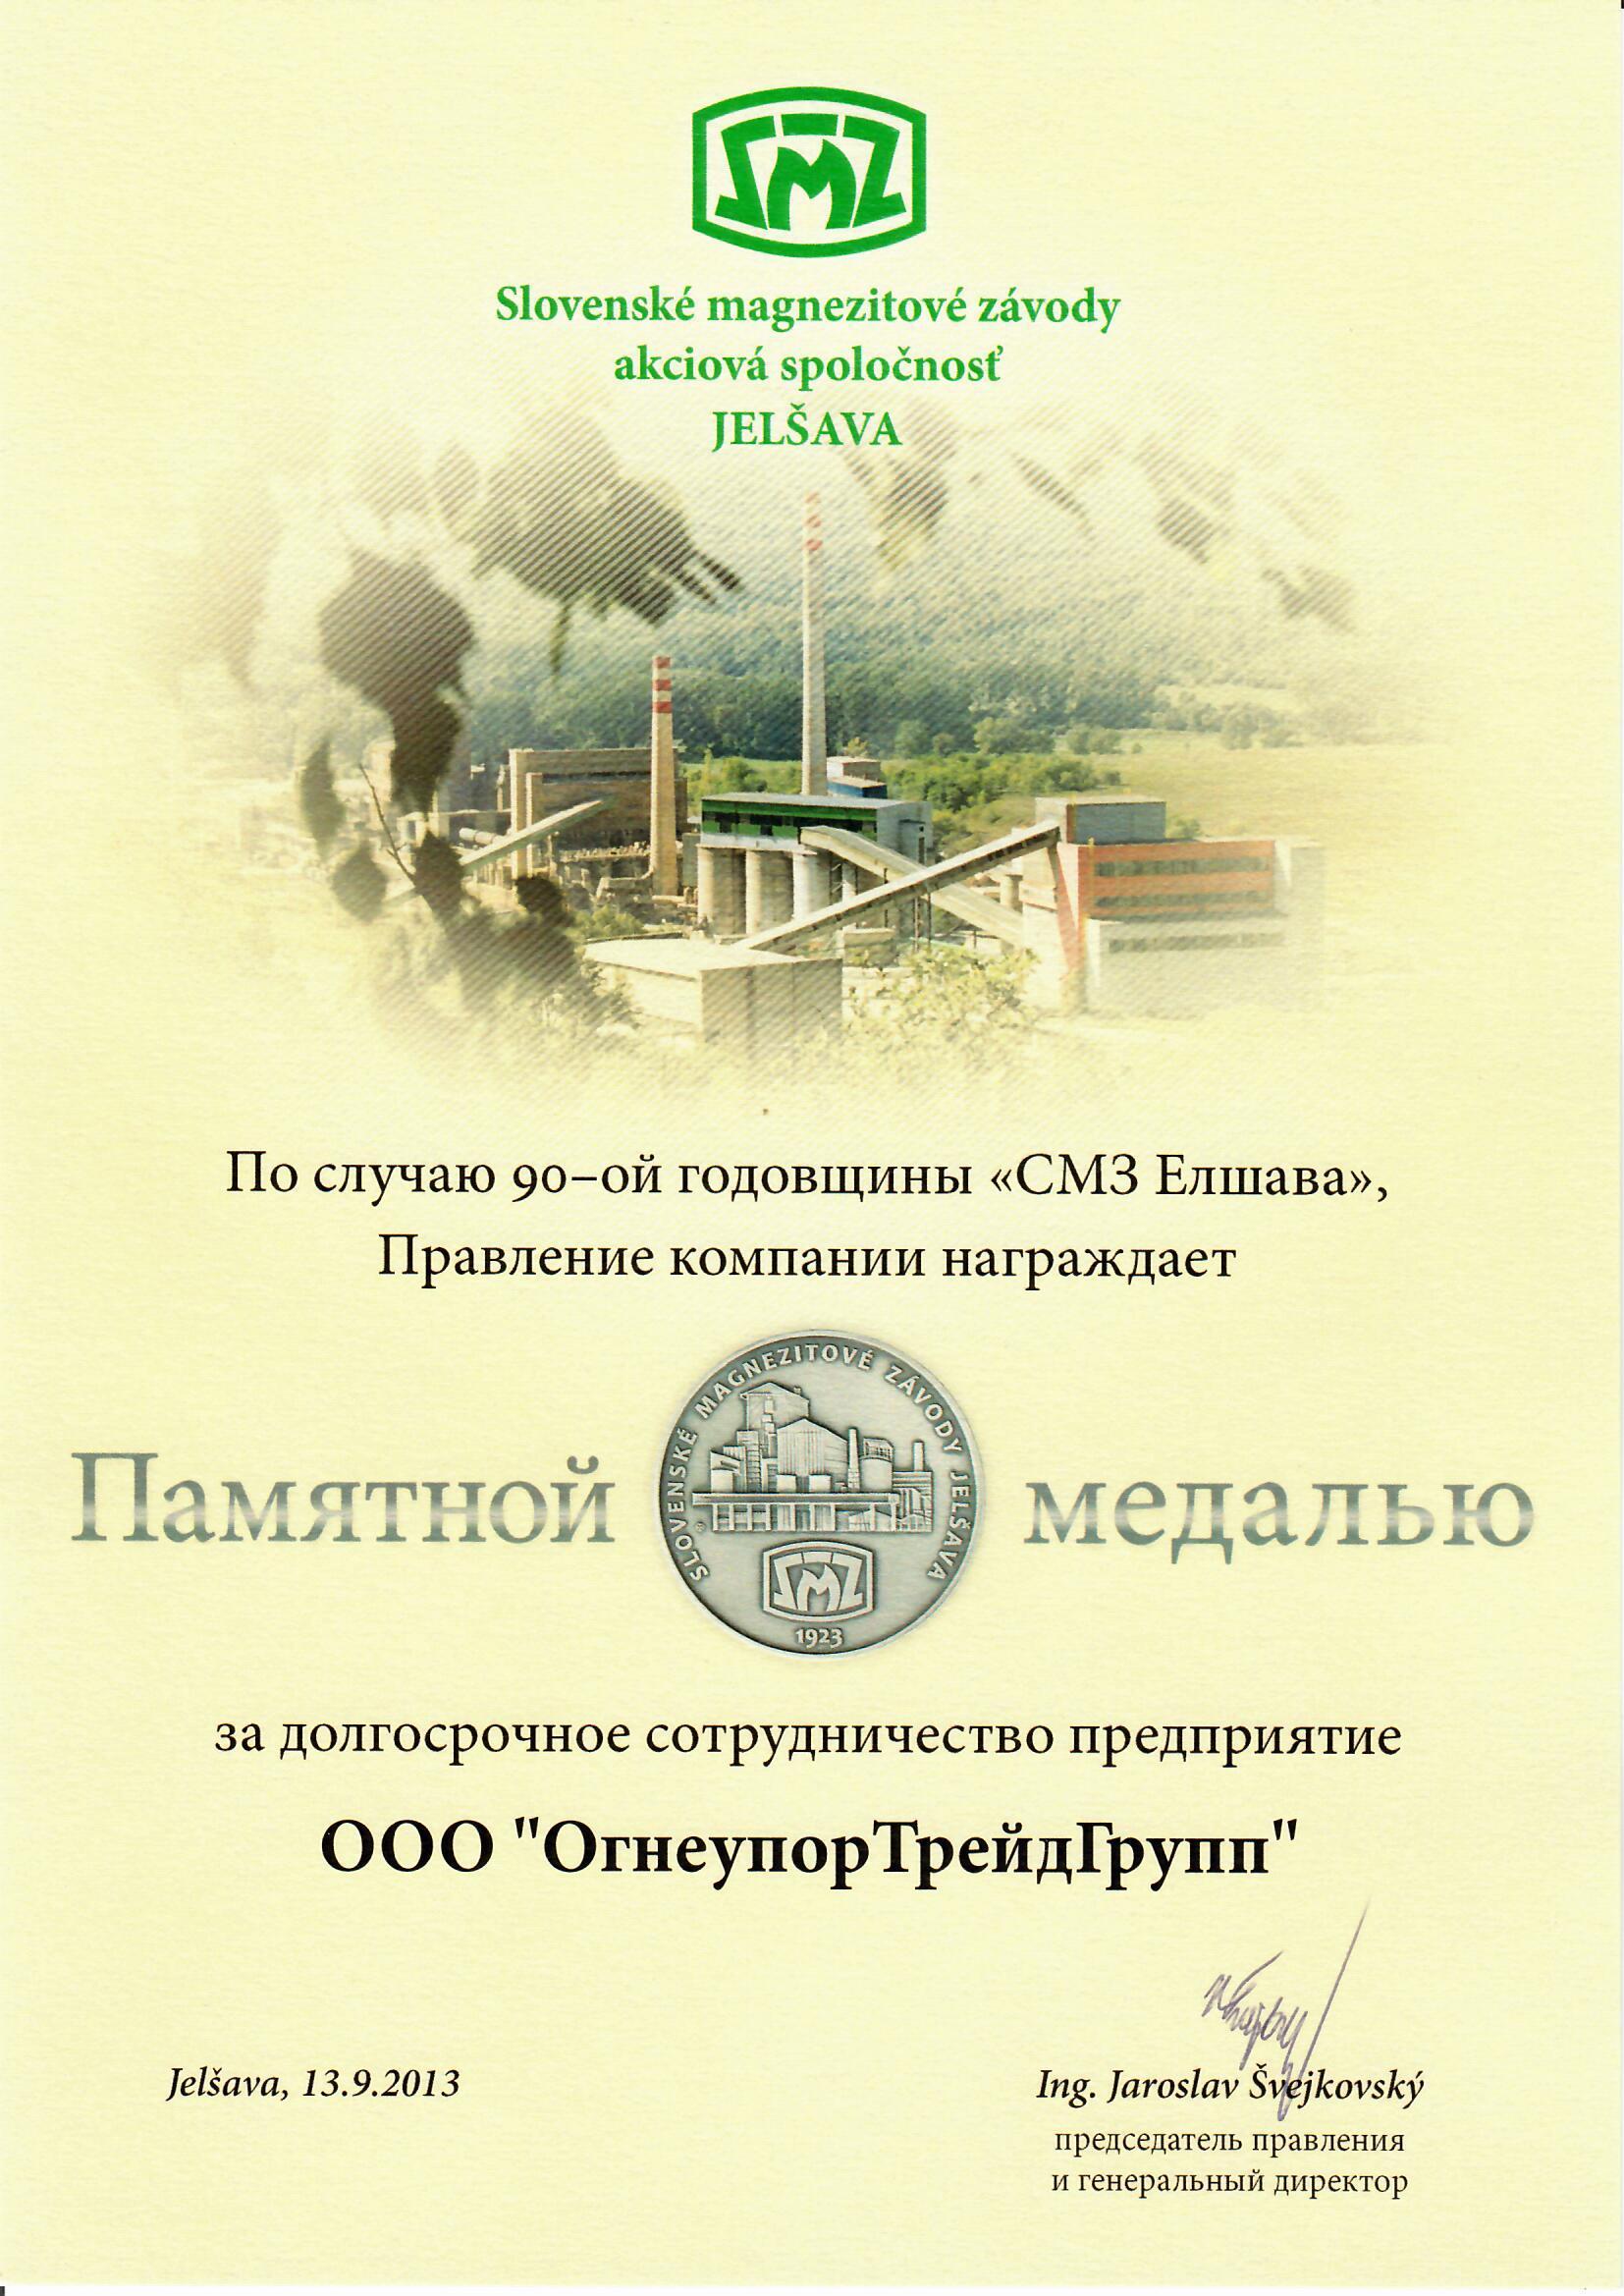 smz_medal